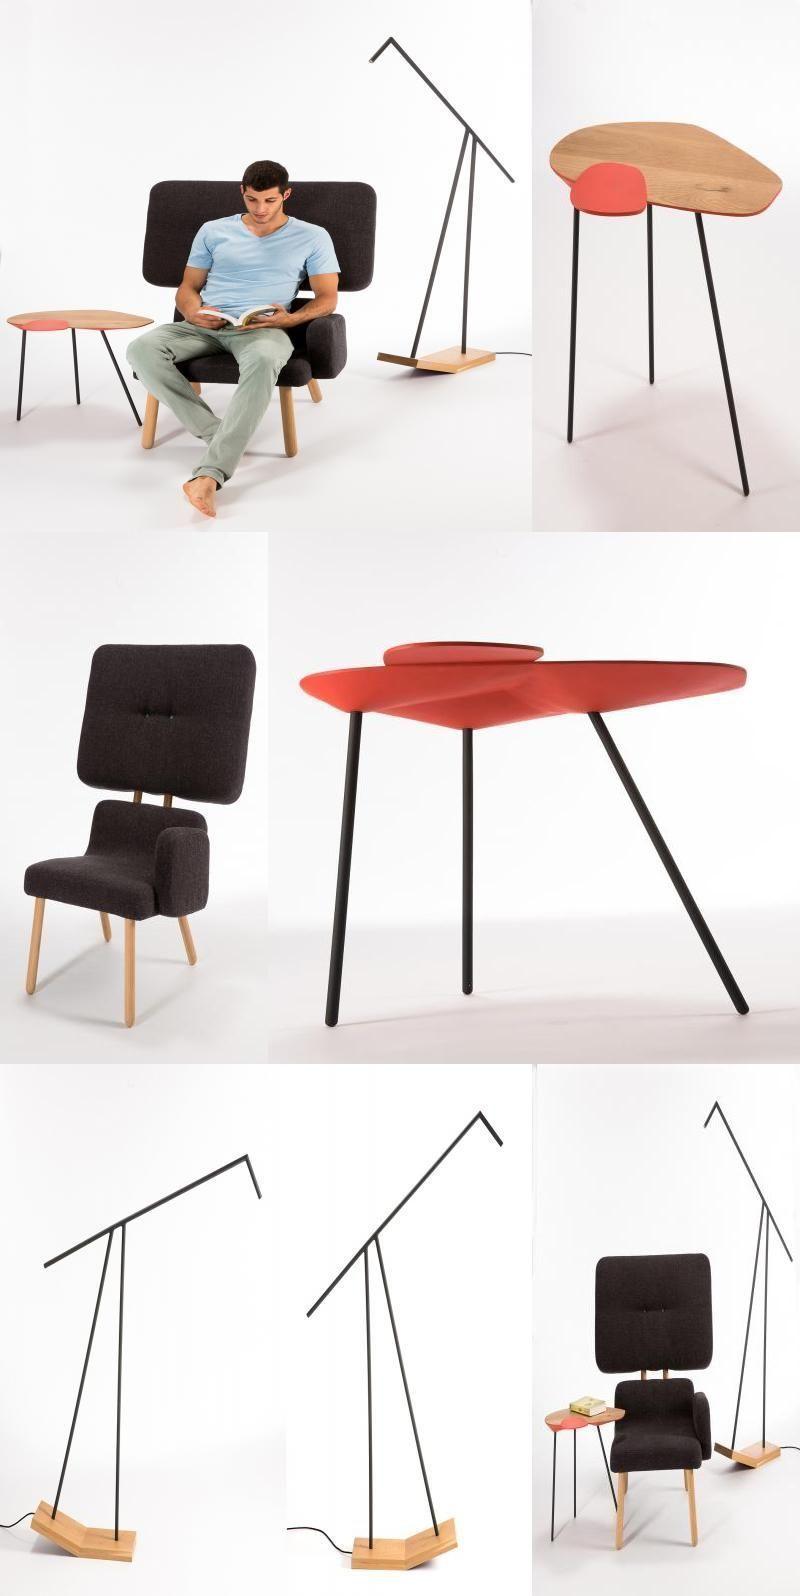 Photo of Design Lesemiljø #Design #Lese miljø # dekoration #apartment # stue